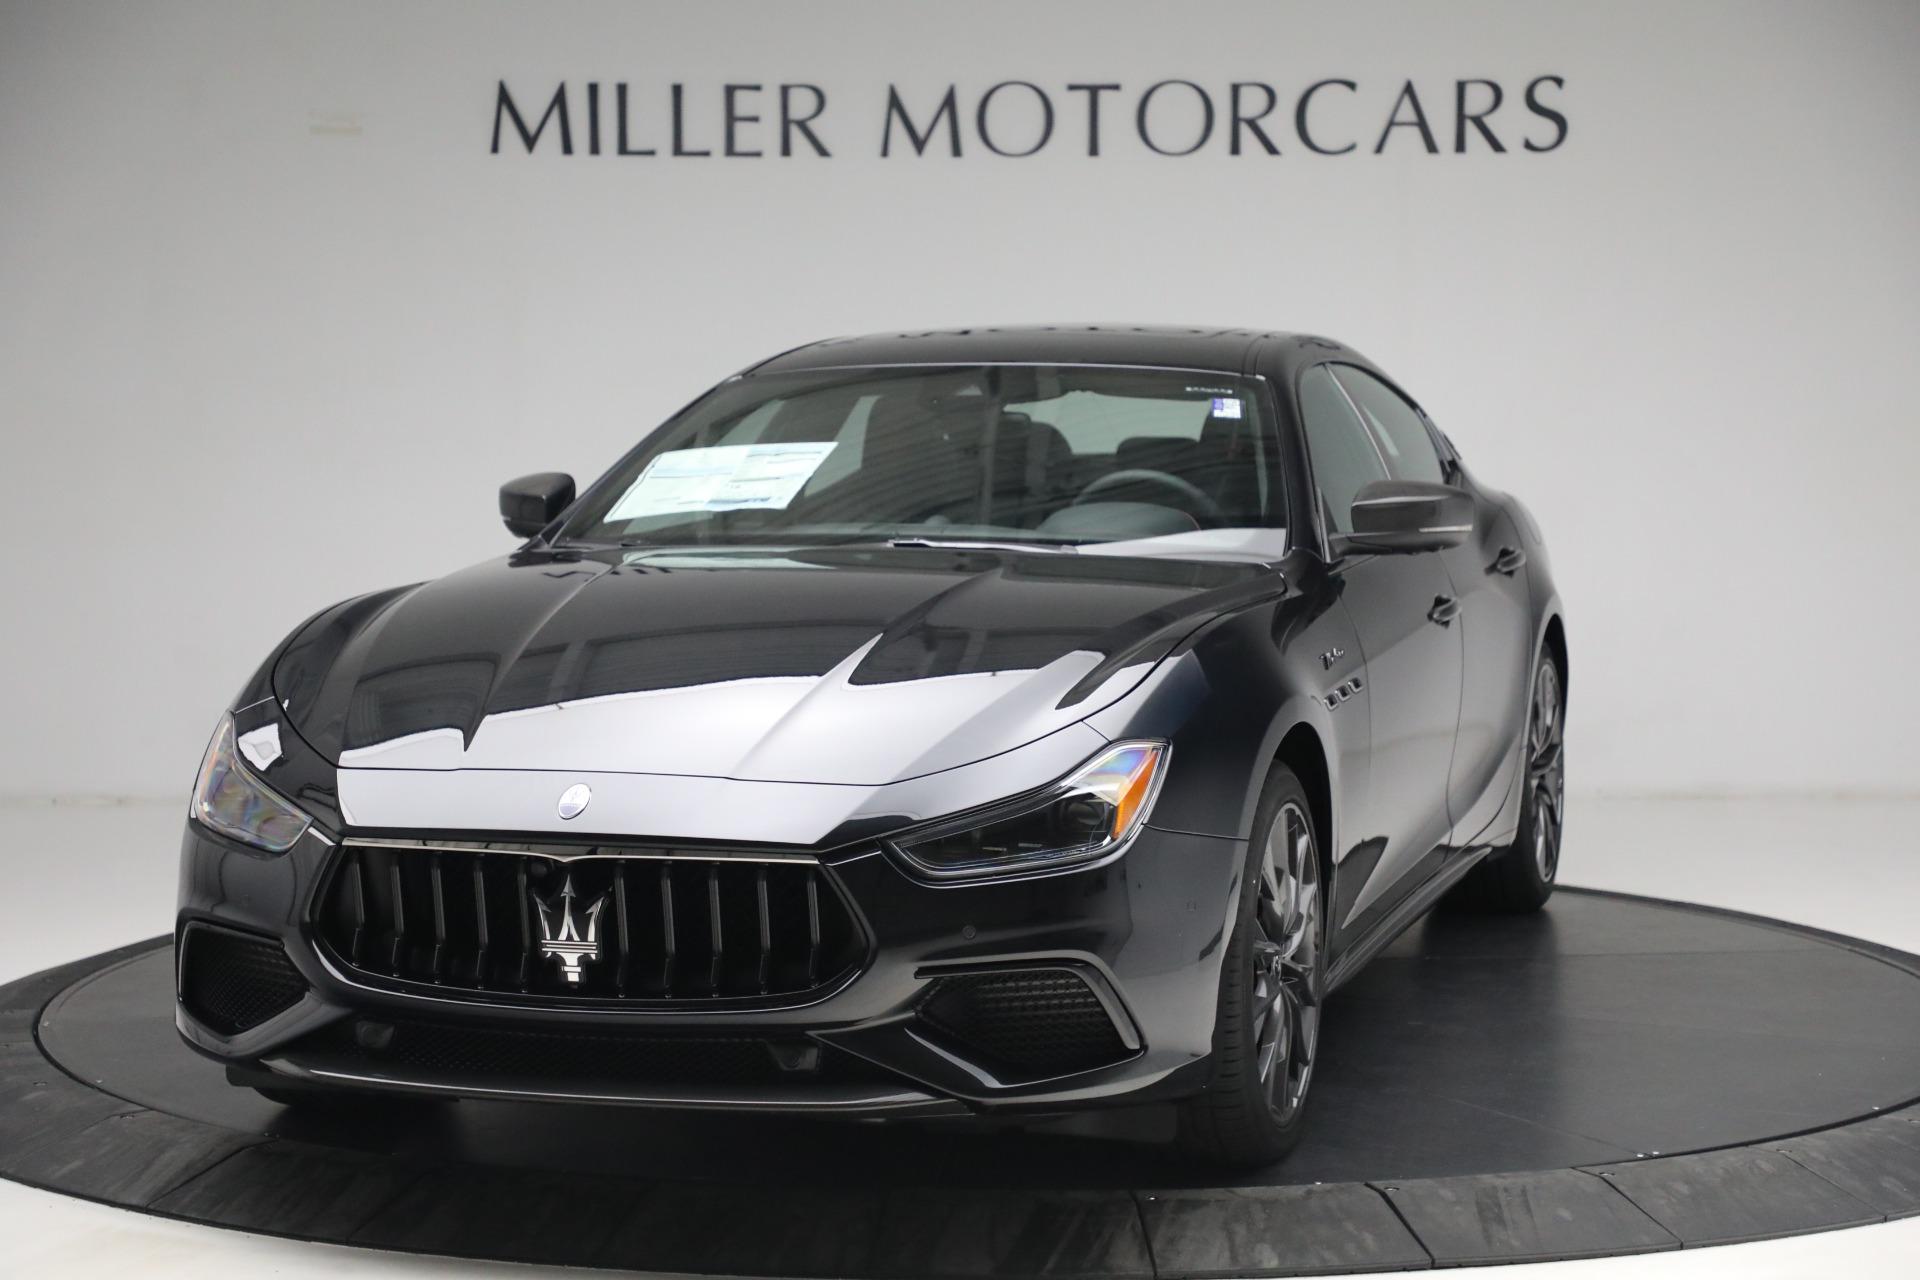 New 2022 Maserati Ghibli Modena Q4 for sale $103,855 at Rolls-Royce Motor Cars Greenwich in Greenwich CT 06830 1